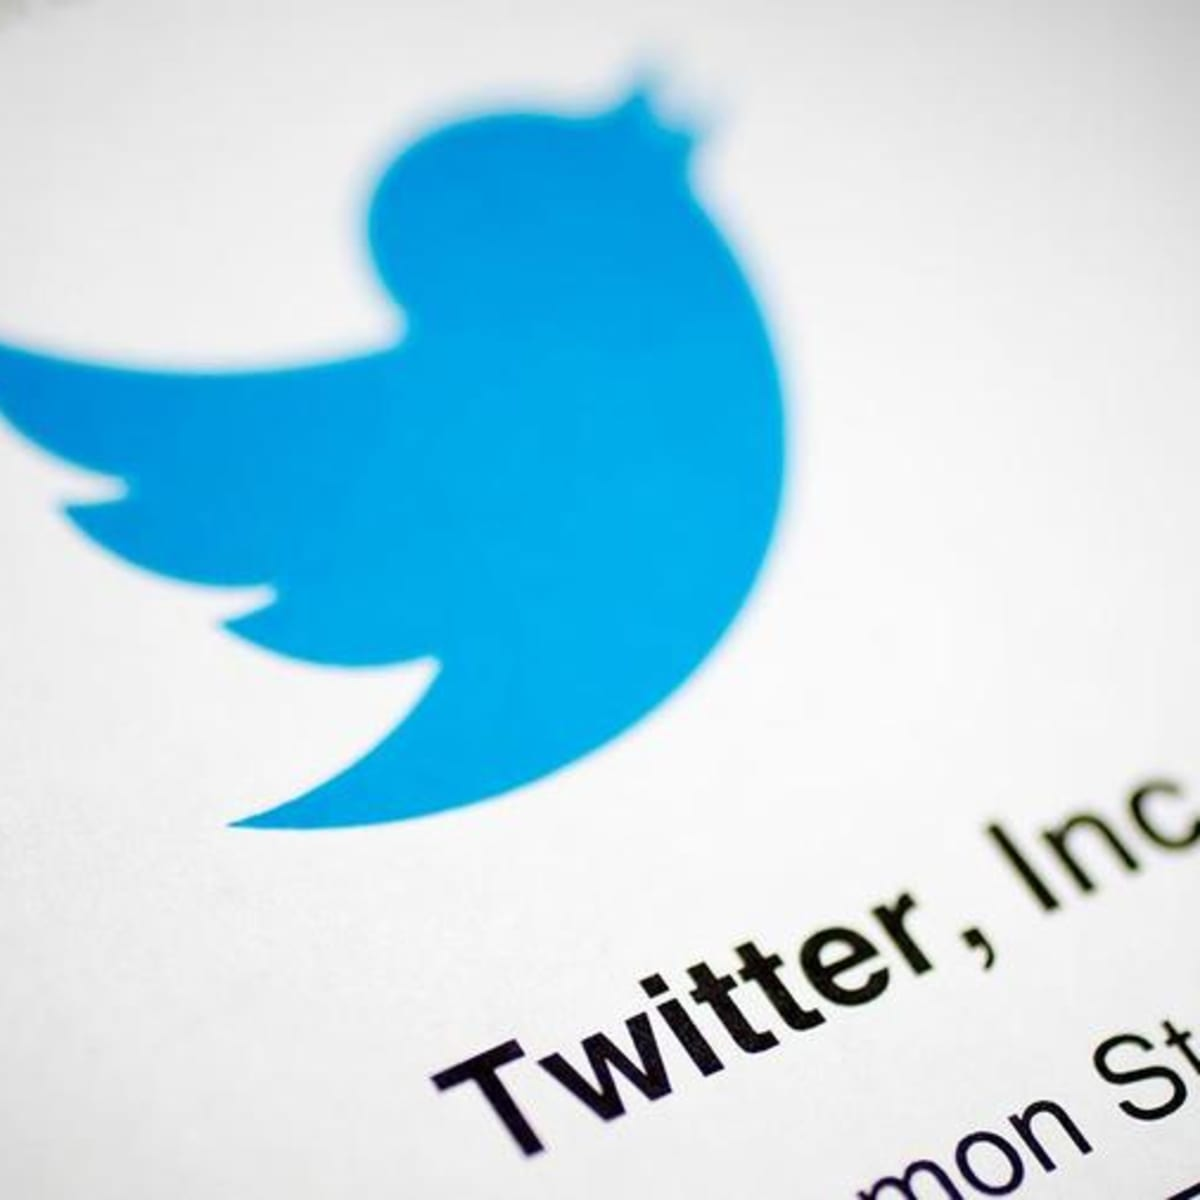 thestreet.com - M. Corey Goldman - Twitter Jumps as CEO Dorsey Touts Bitcoin as 'Big Part' of Future